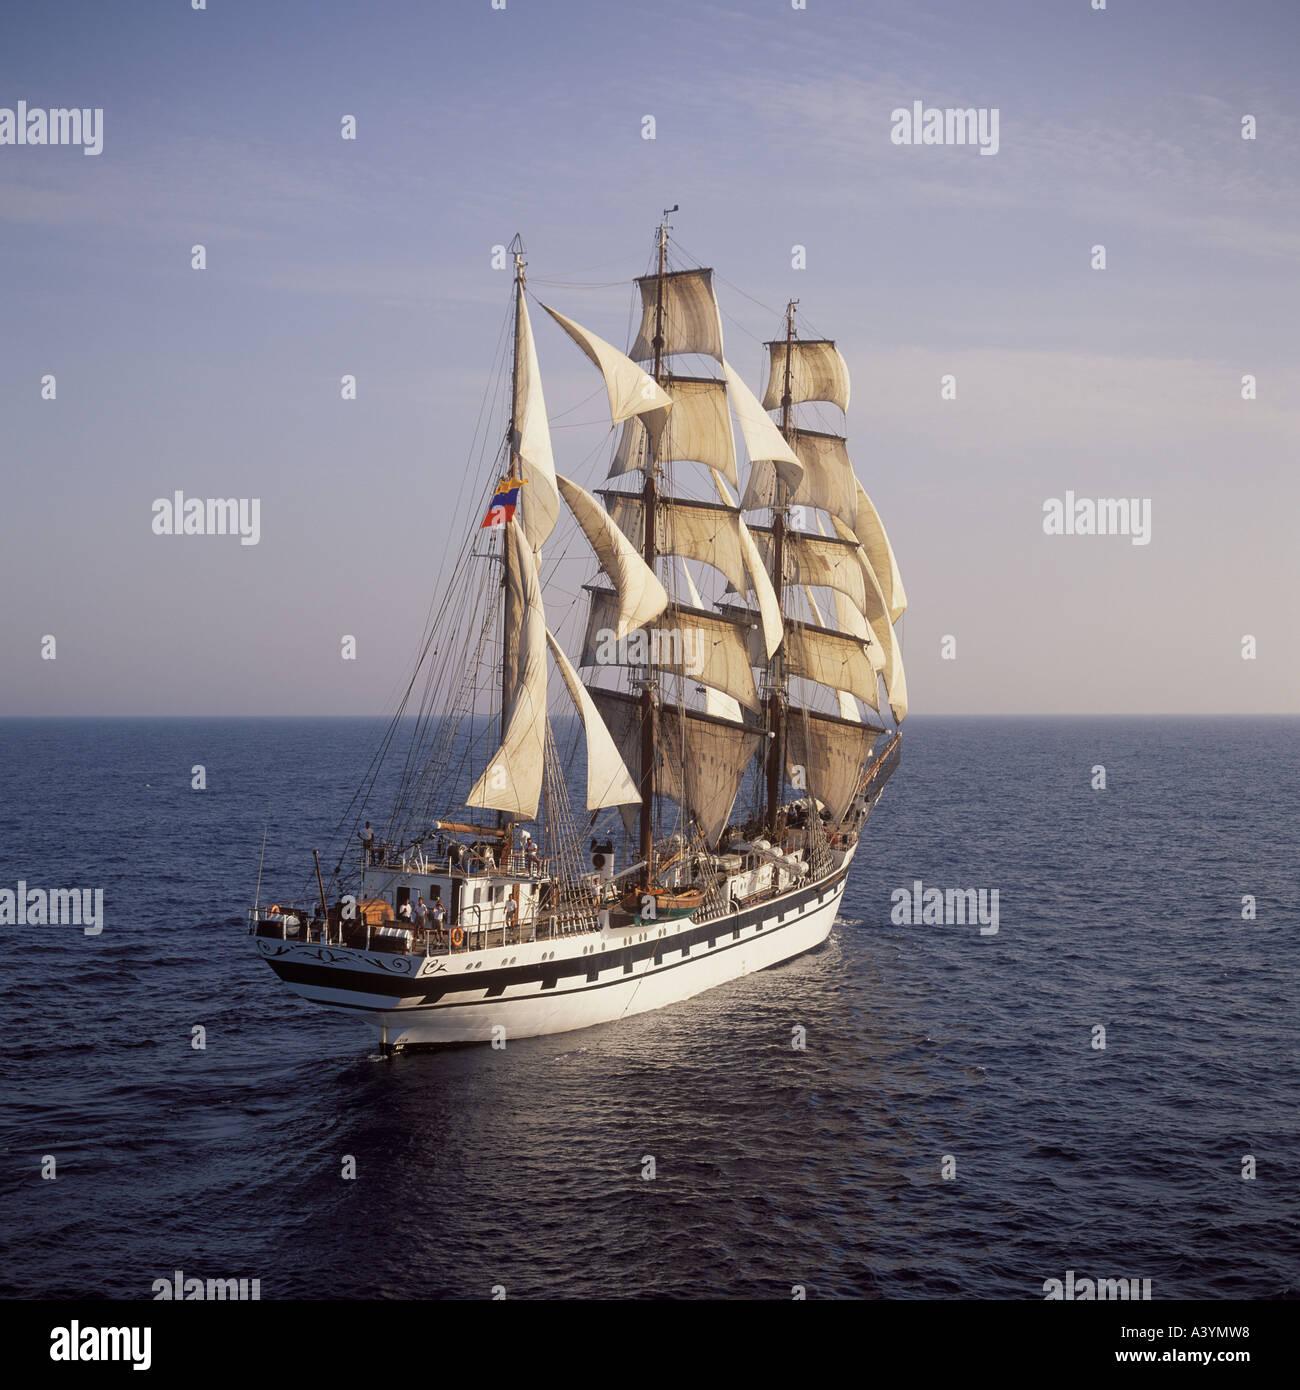 Aerial view of 'Simon Bolivar' Venezuela sailing south of Palma de Mallorca Baleares Spain Cutty Sark Tall Ships race. - Stock Image